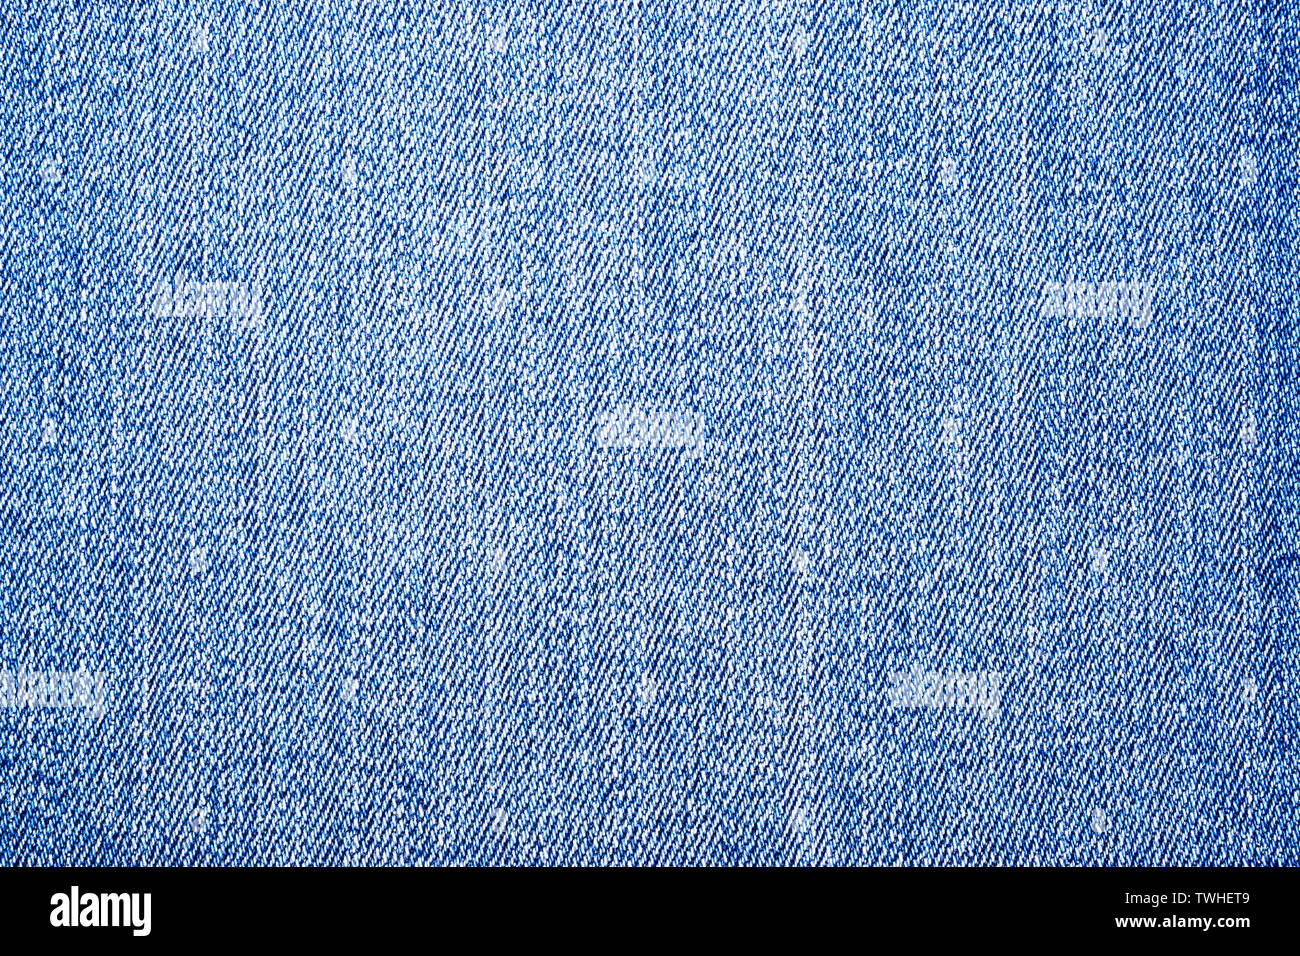 light blue denim jeans texture background, denim texture background. Stock Photo